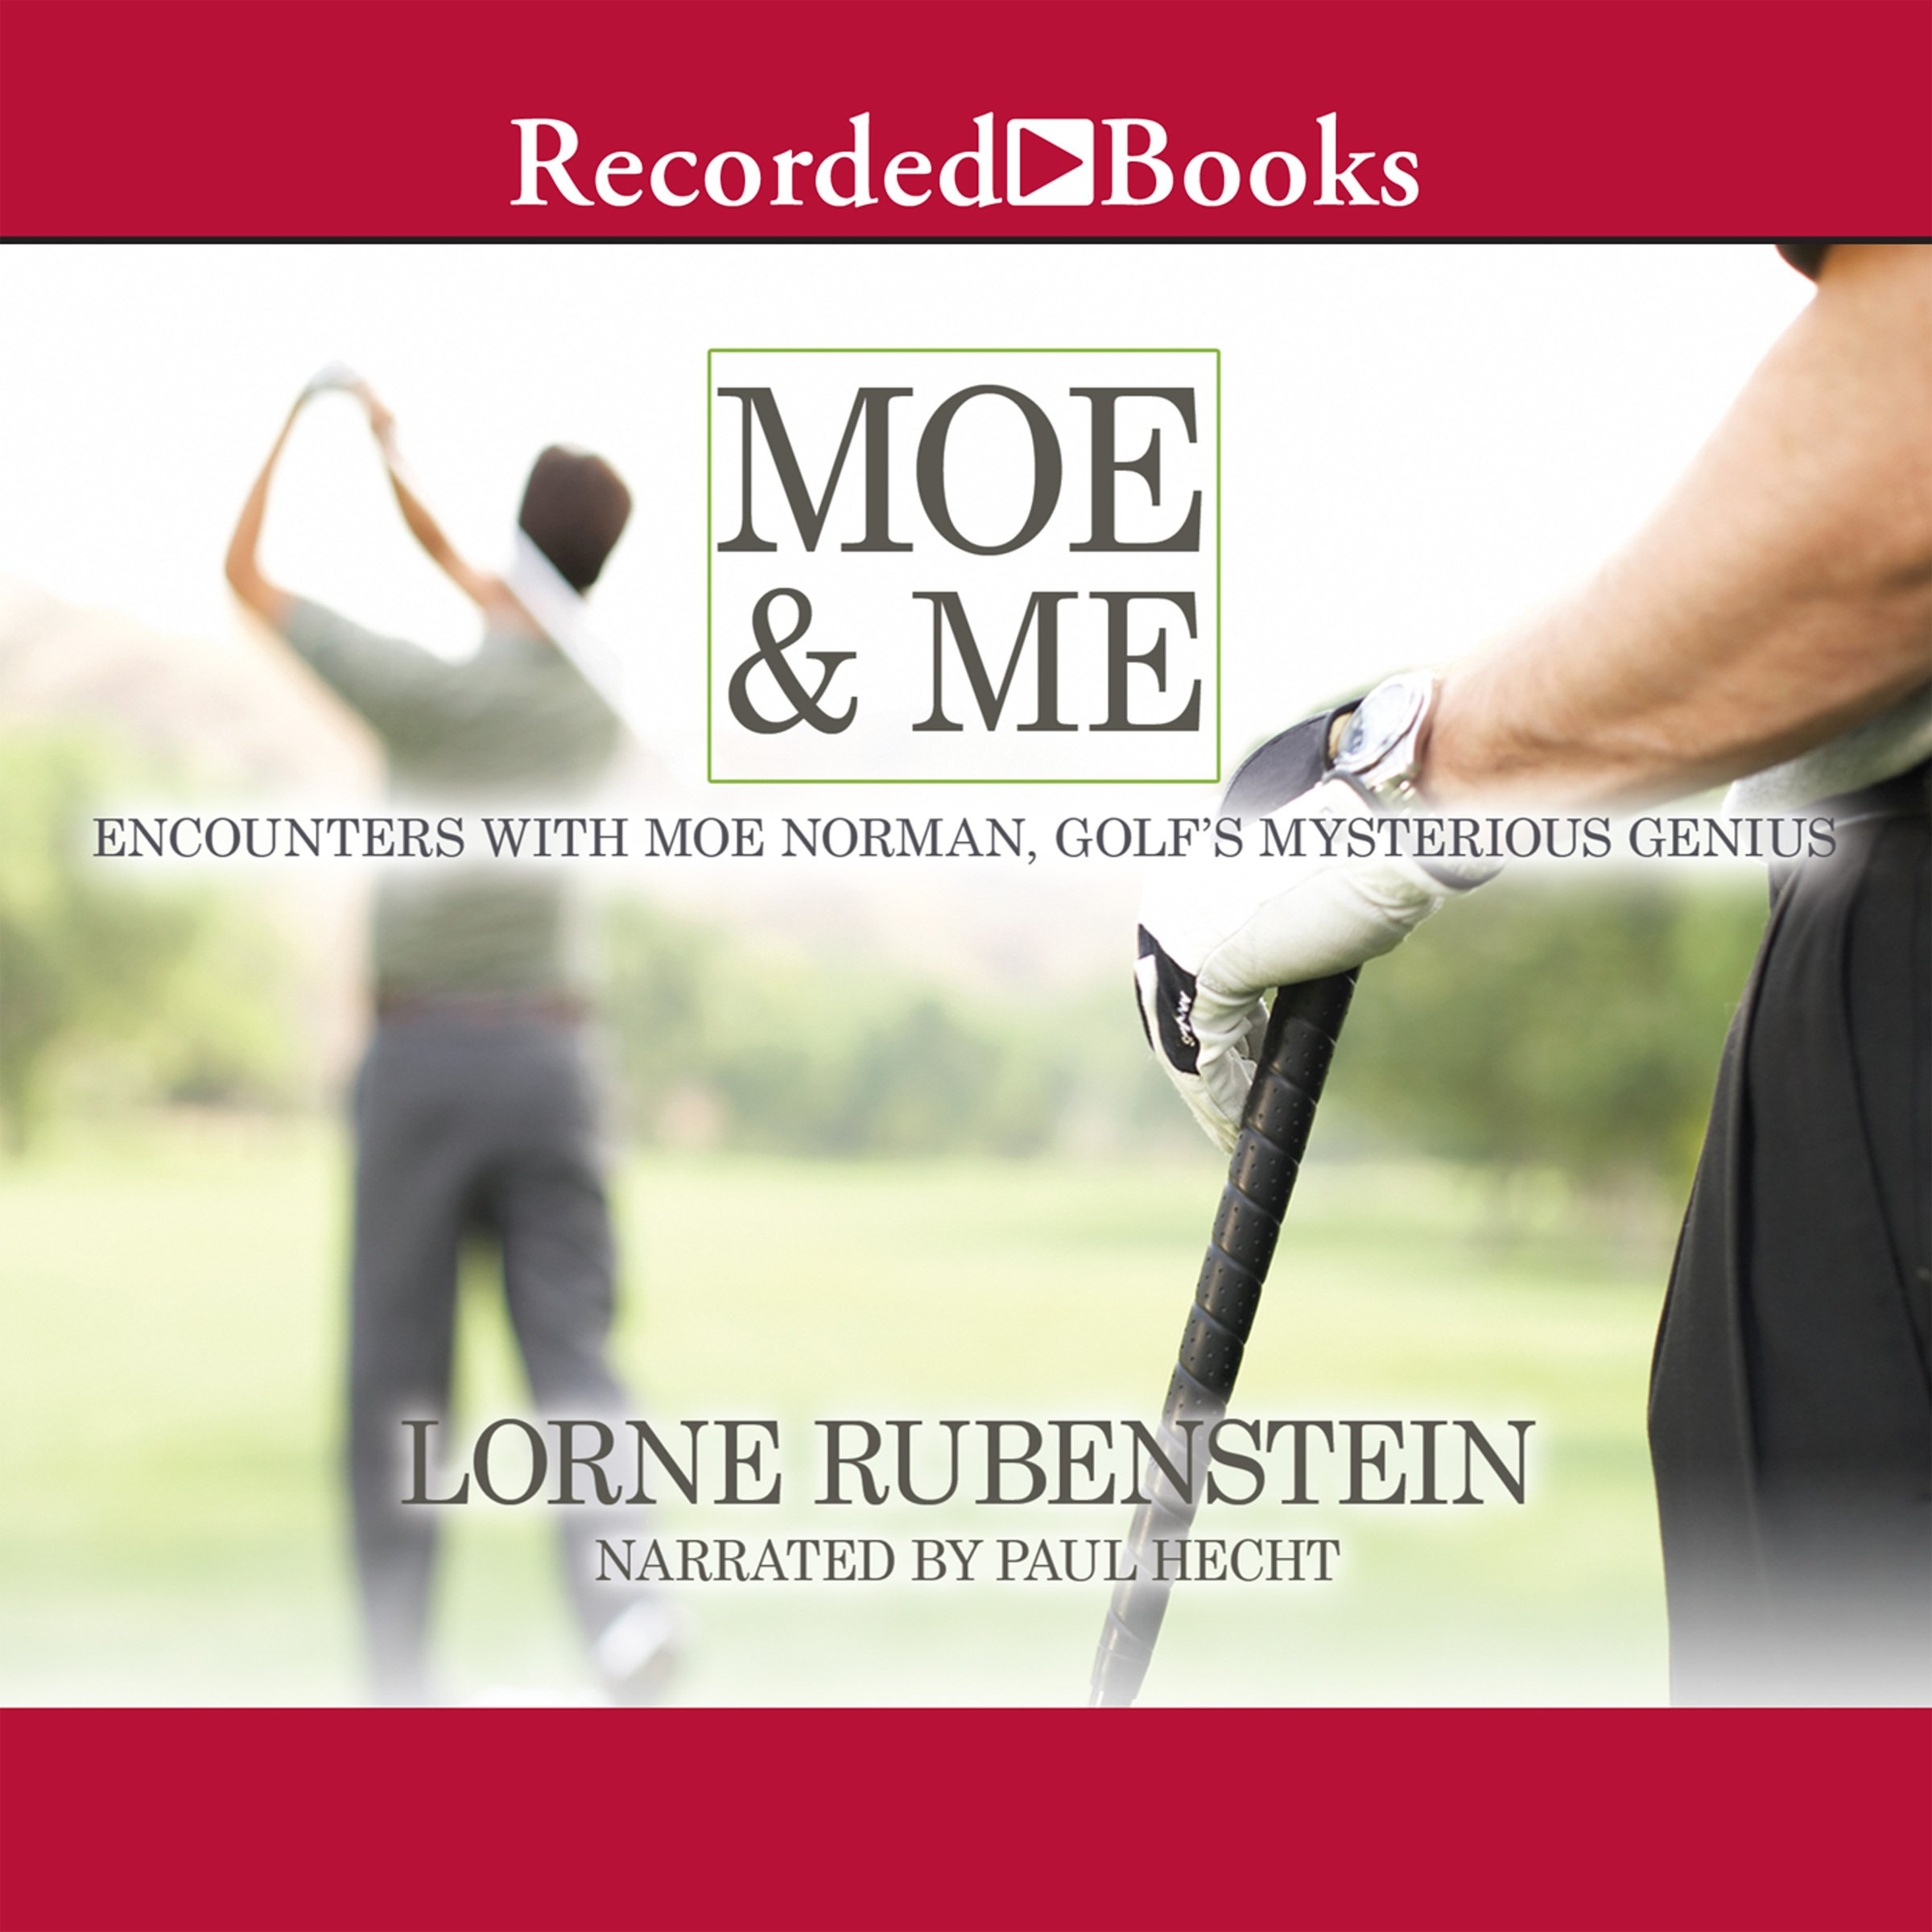 Moe & Me: Encounters with Moe Norman, Golf's Mysterious Genius